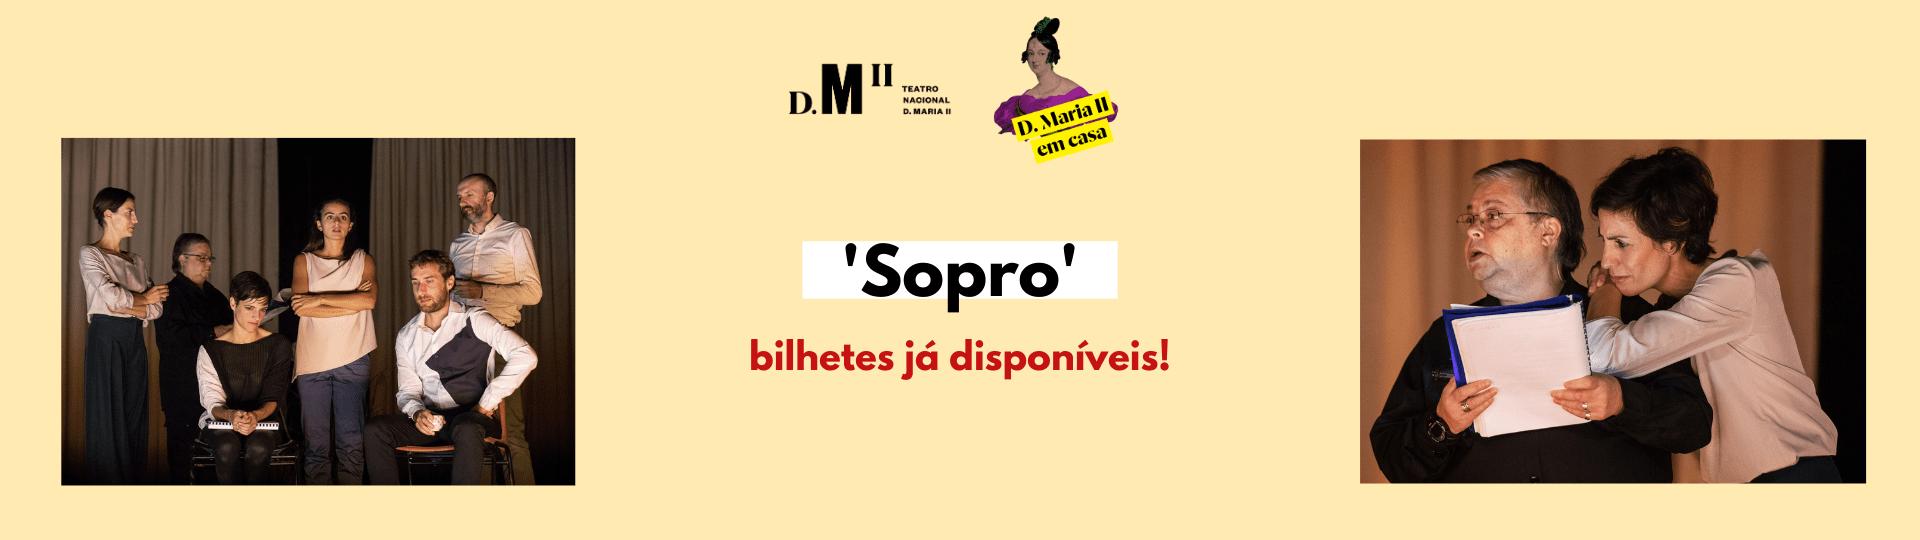 Sopro - TNDM II